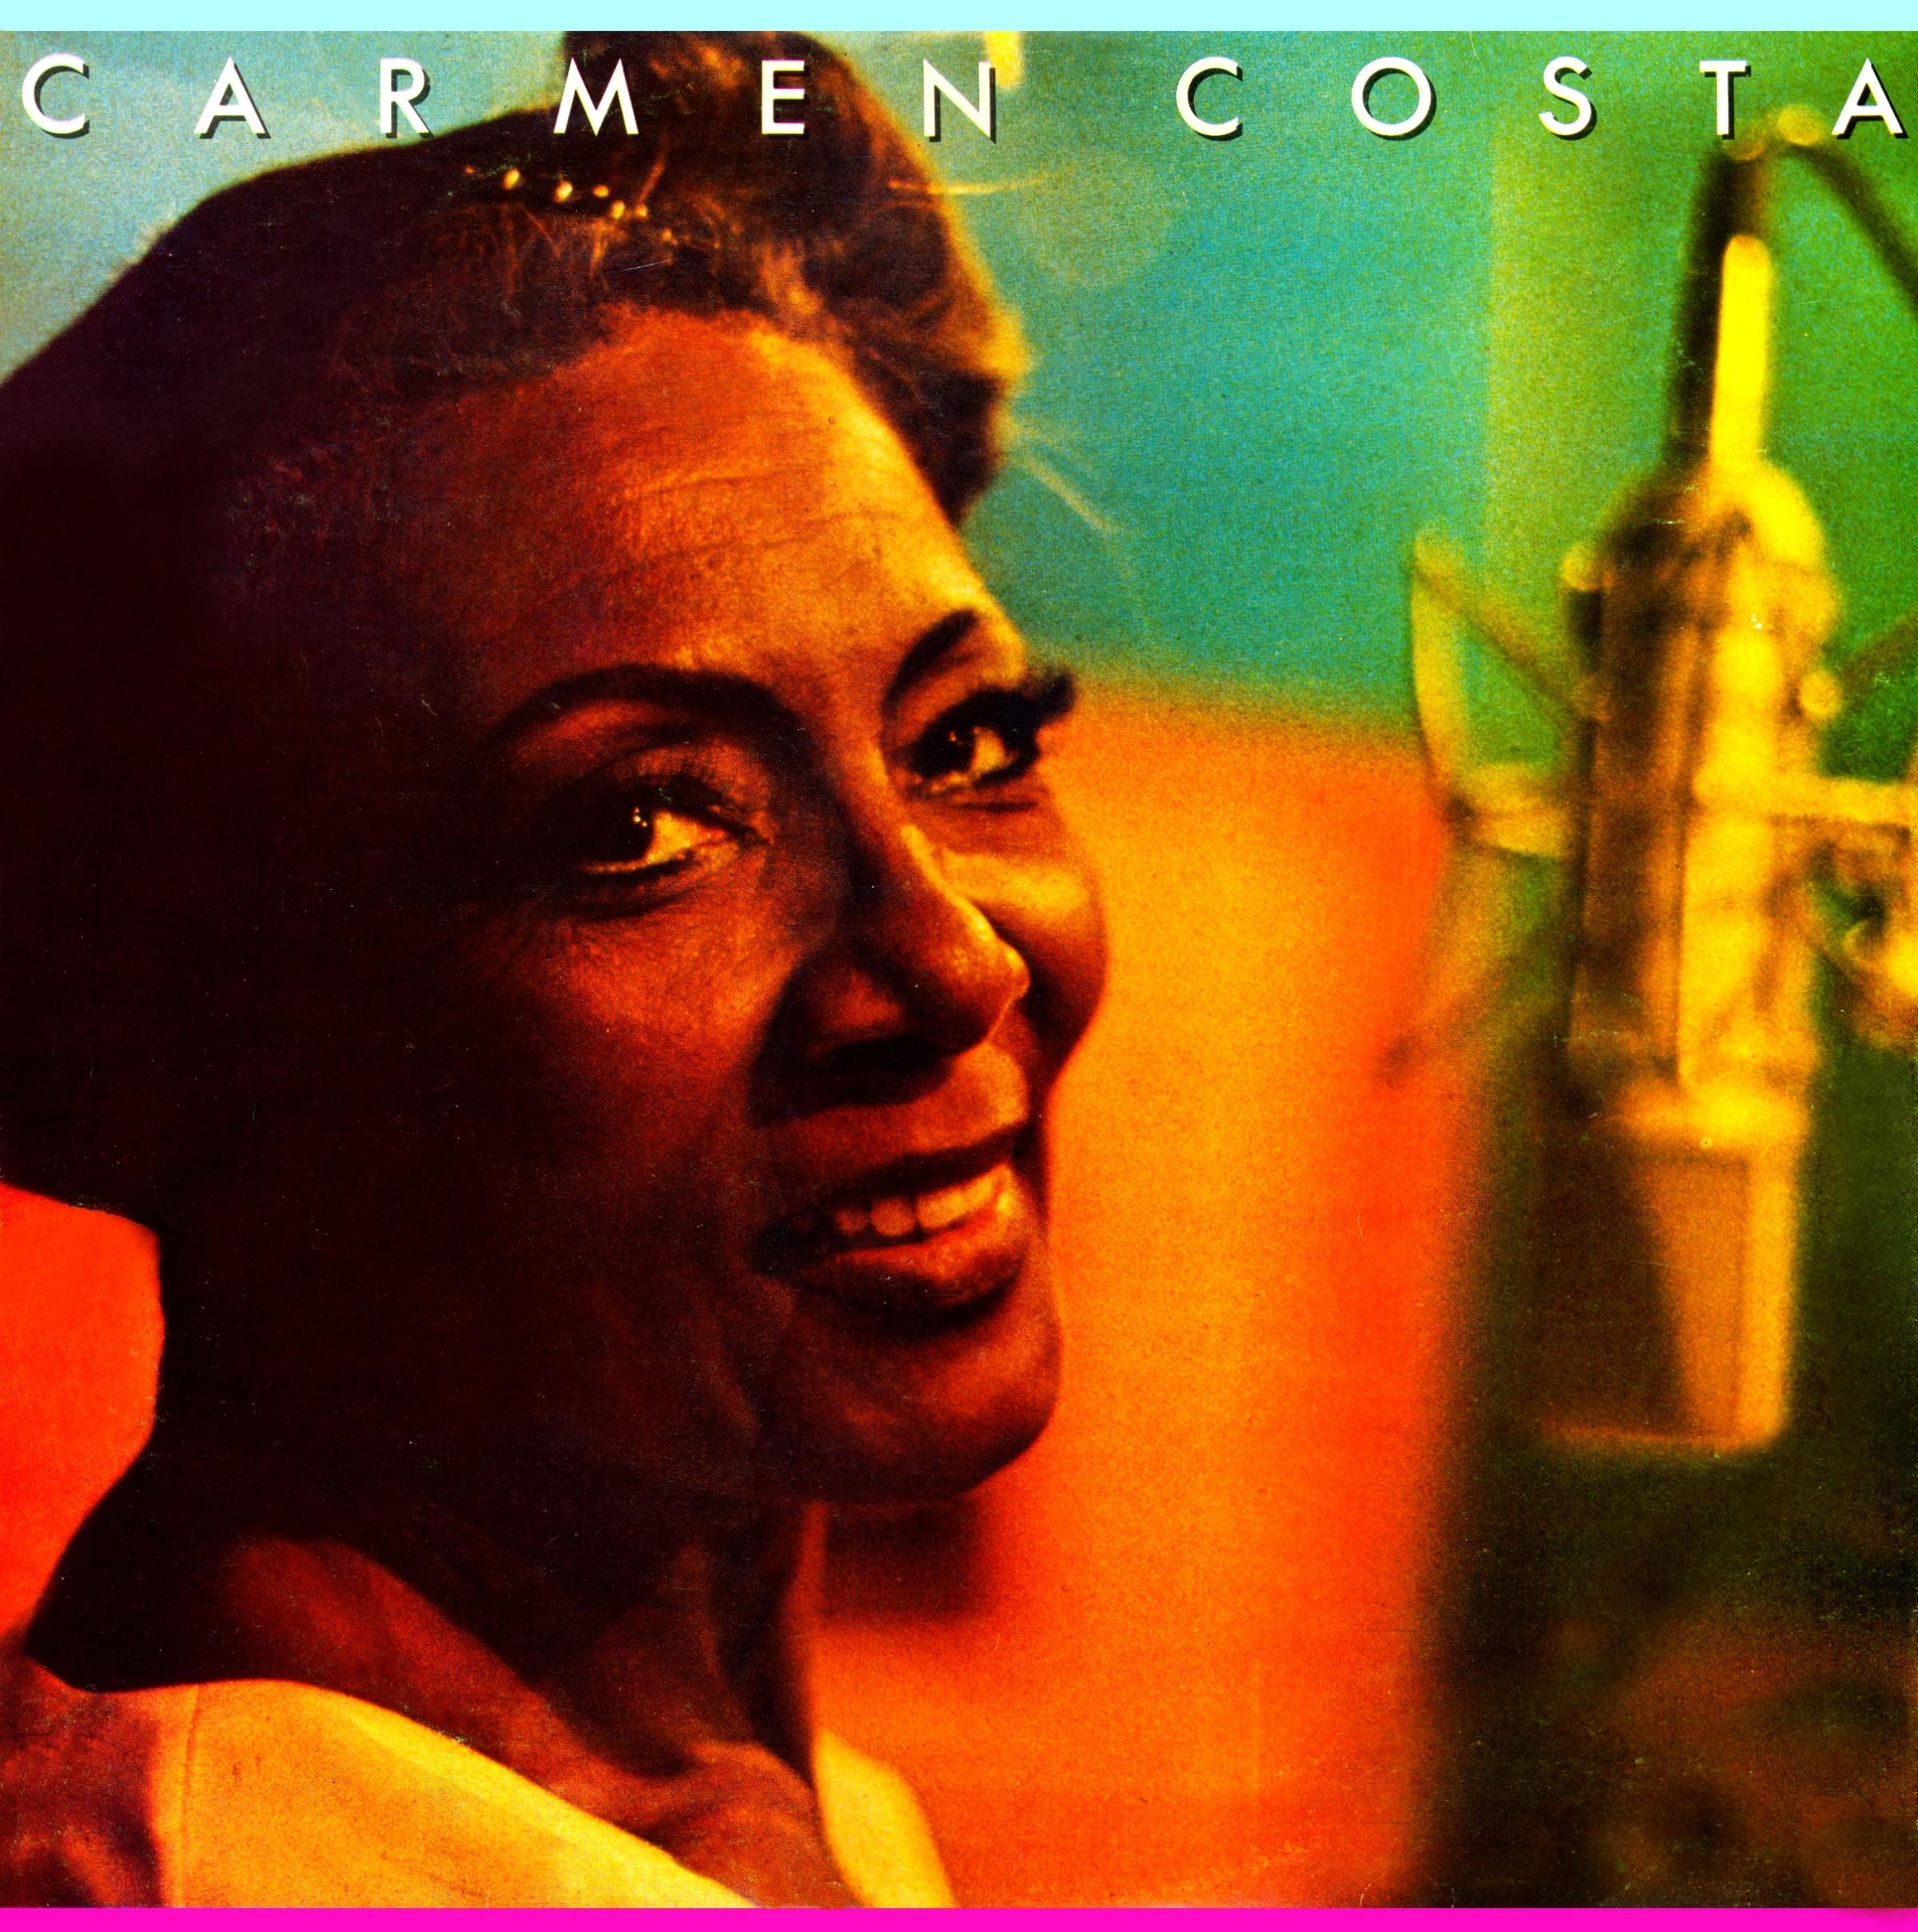 Carmen Costa Biografia - Carmelita Madriaga